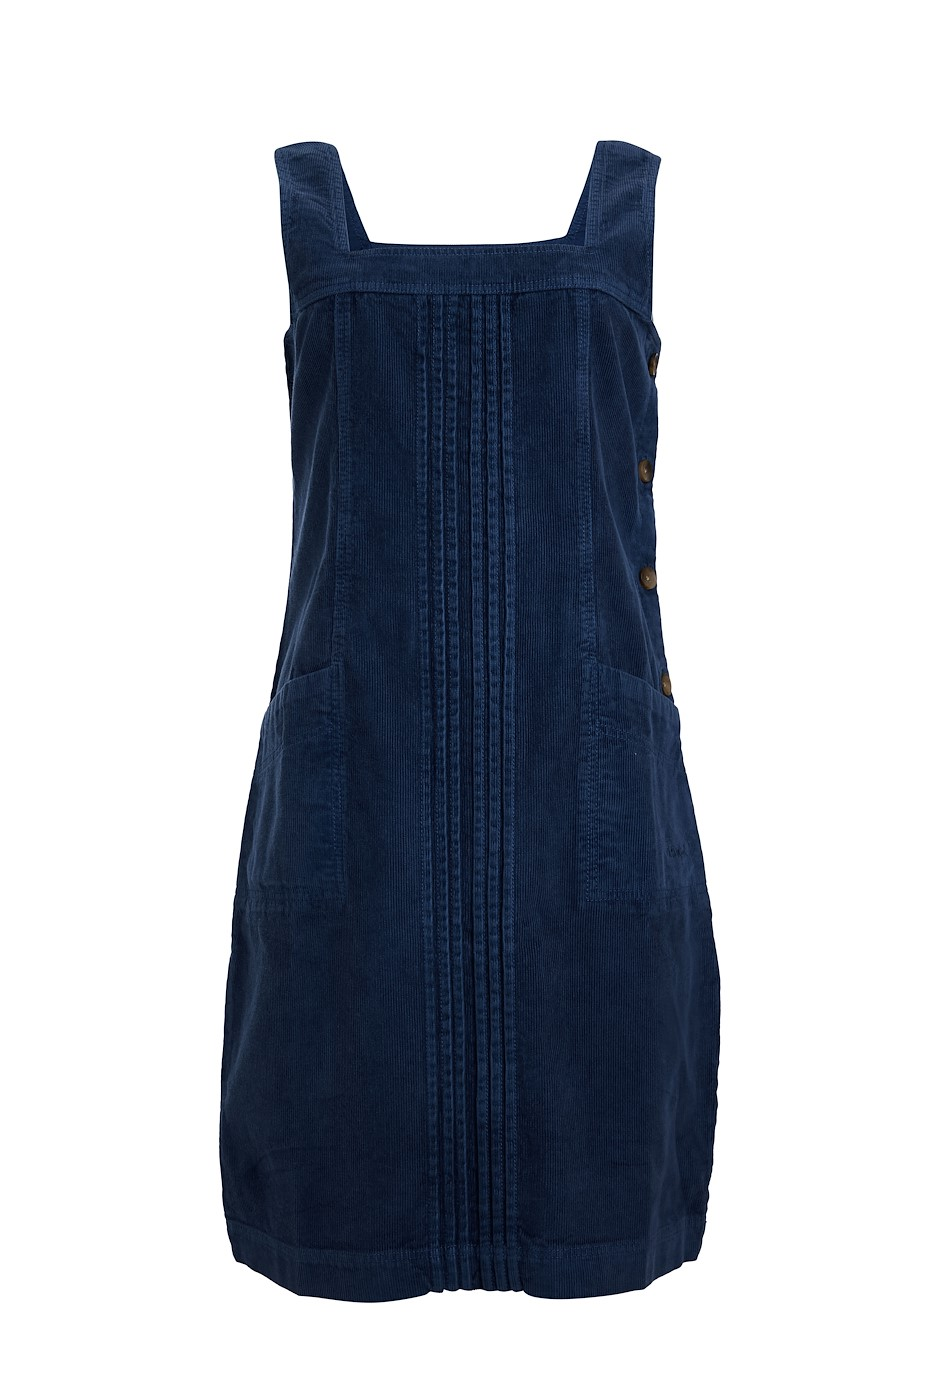 Elowen Cord Pinafore Dress Navy